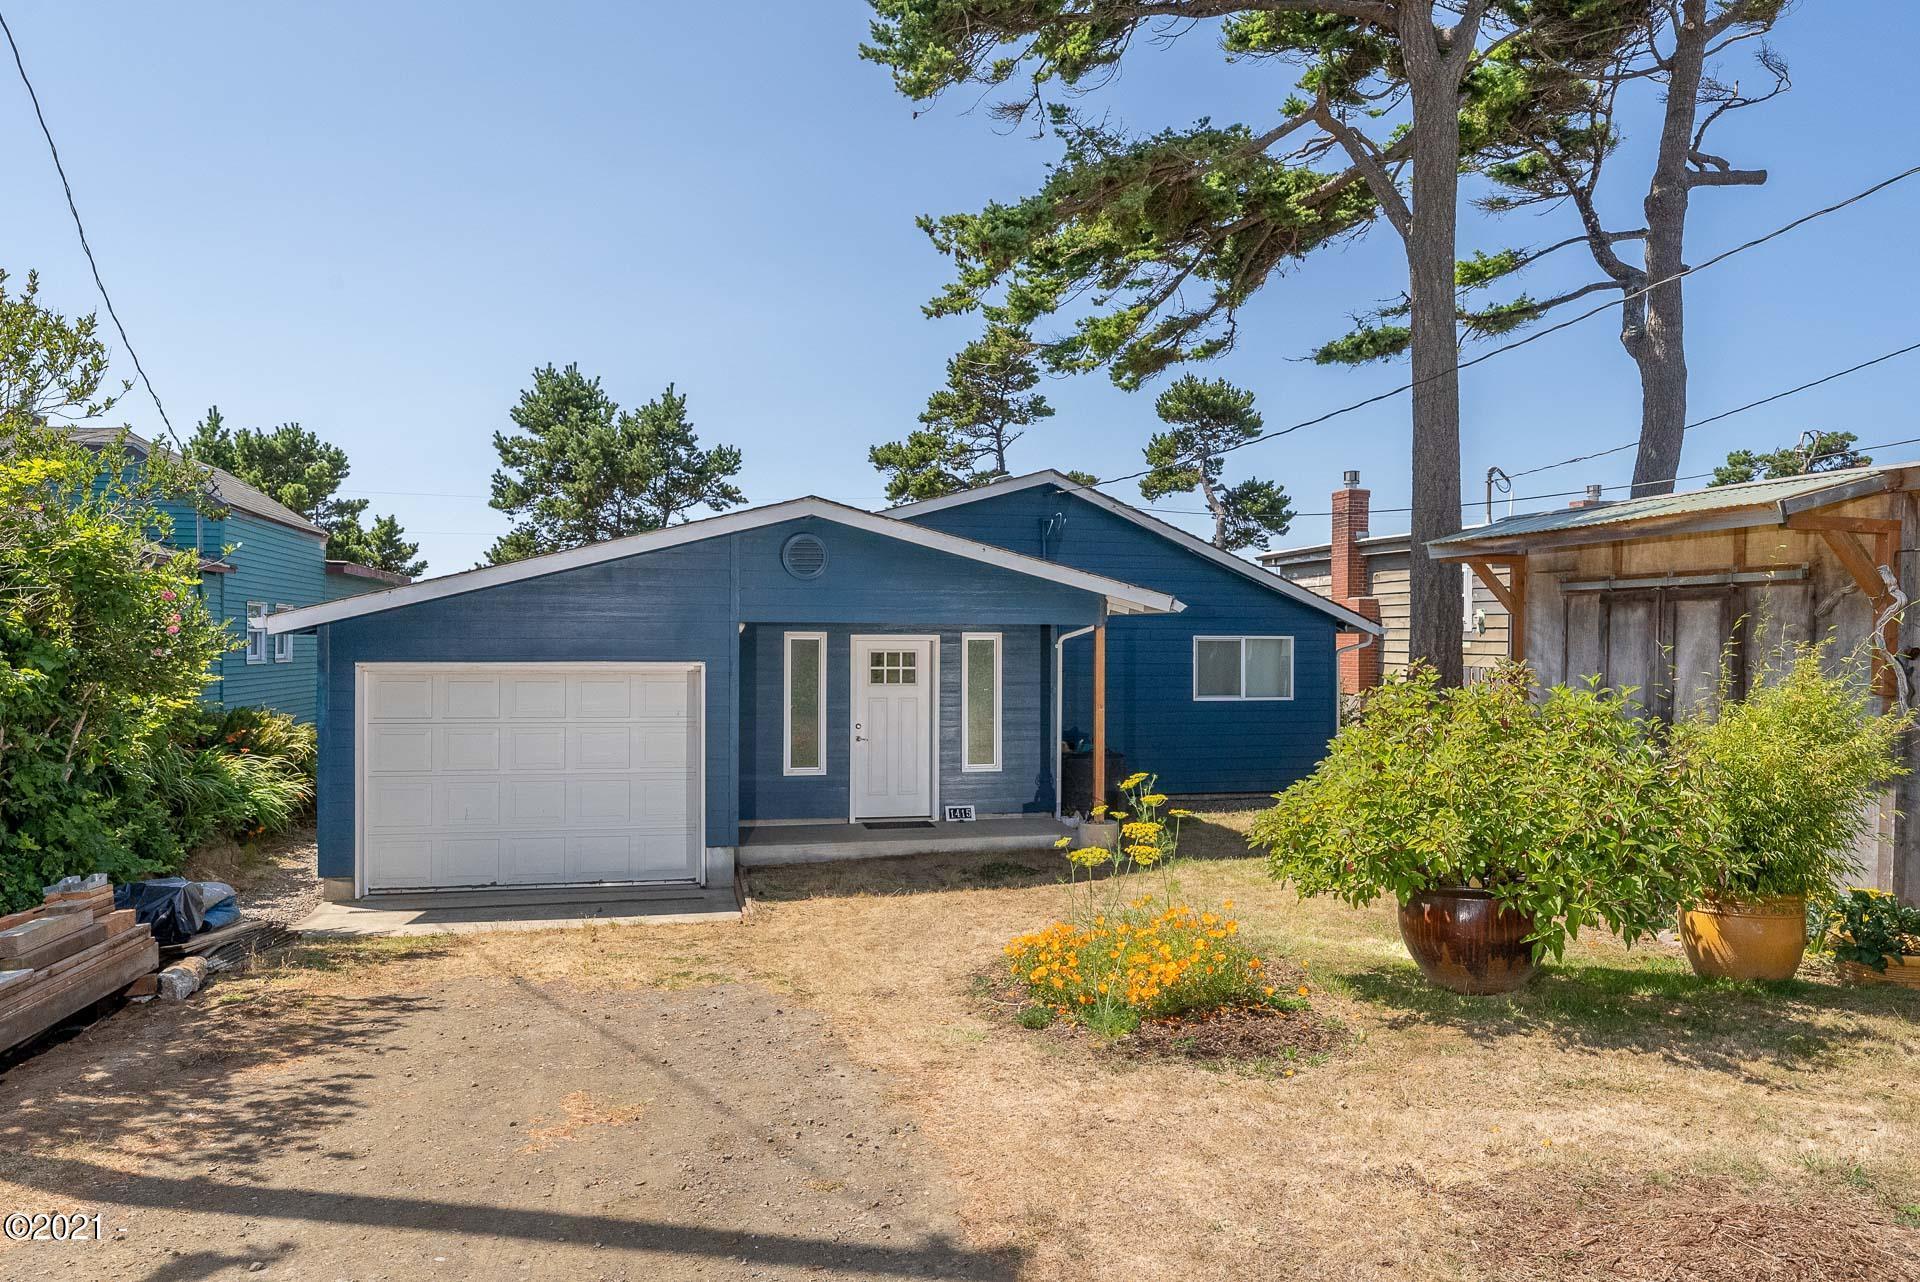 1415 Nw Lake Street, Newport, OR 97365 - 1415 NW Lake